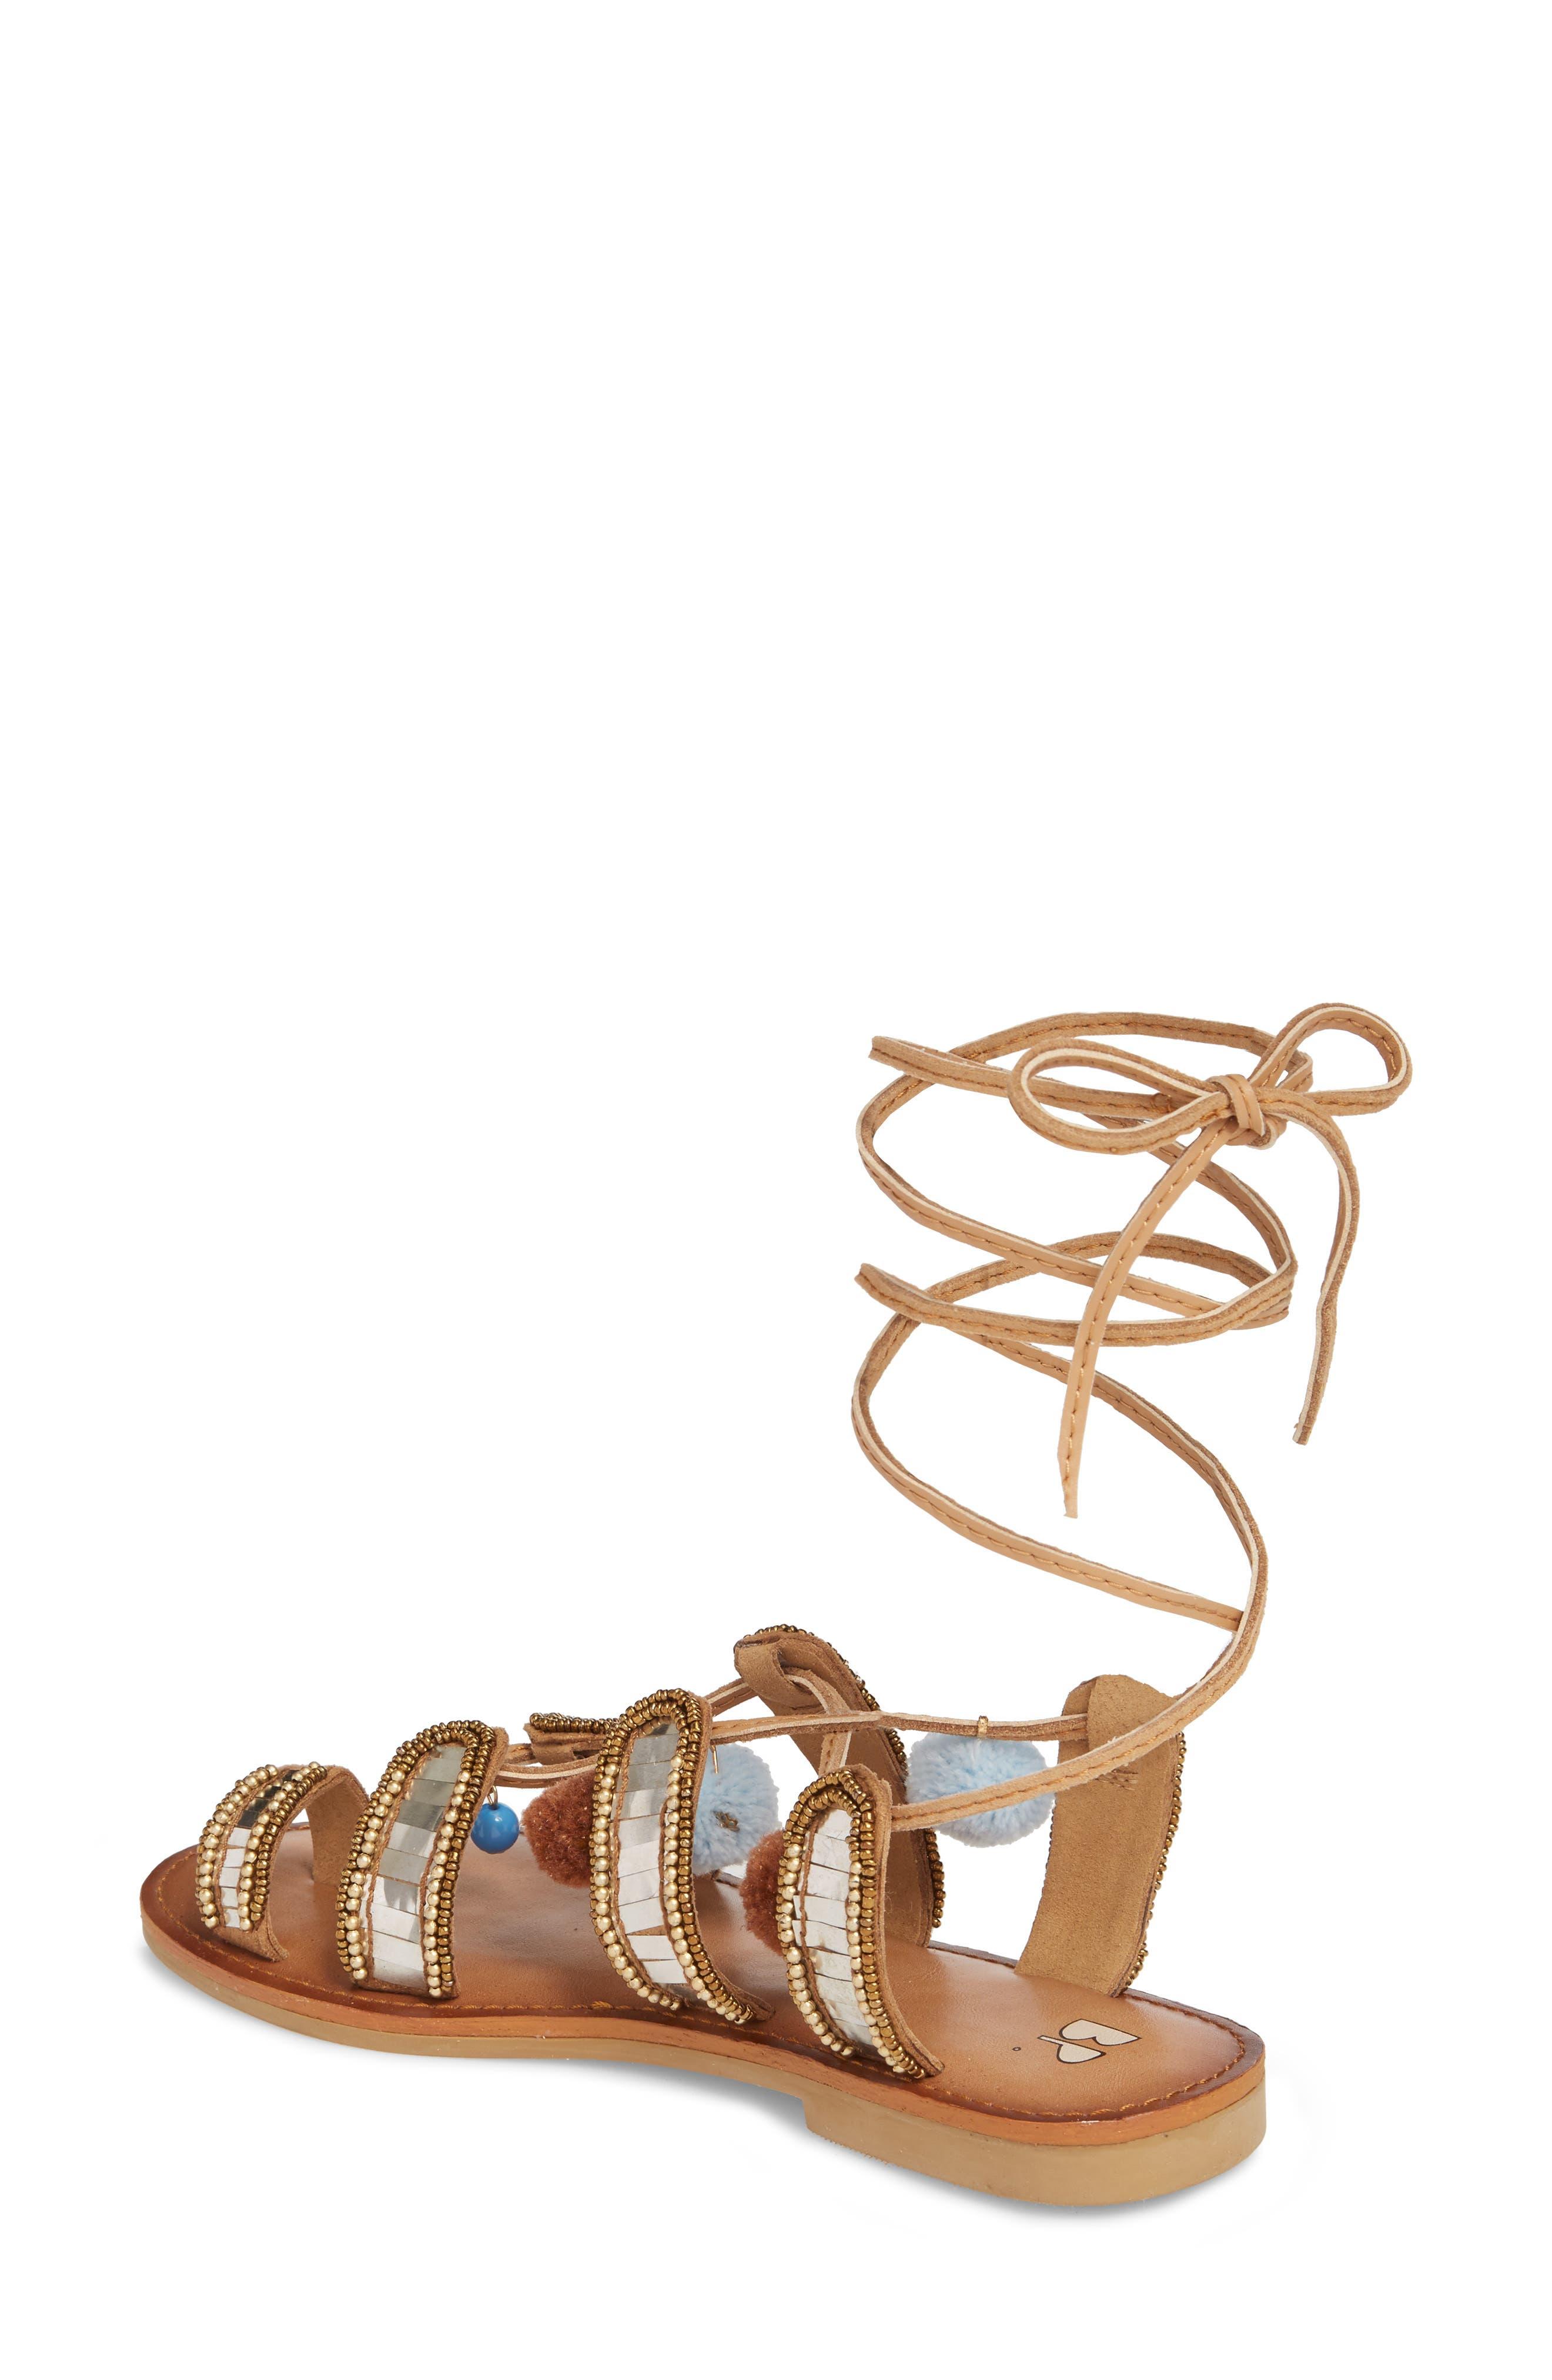 Bassie Ankle Strap Sandal,                             Alternate thumbnail 2, color,                             Brown Multi Faux Suede